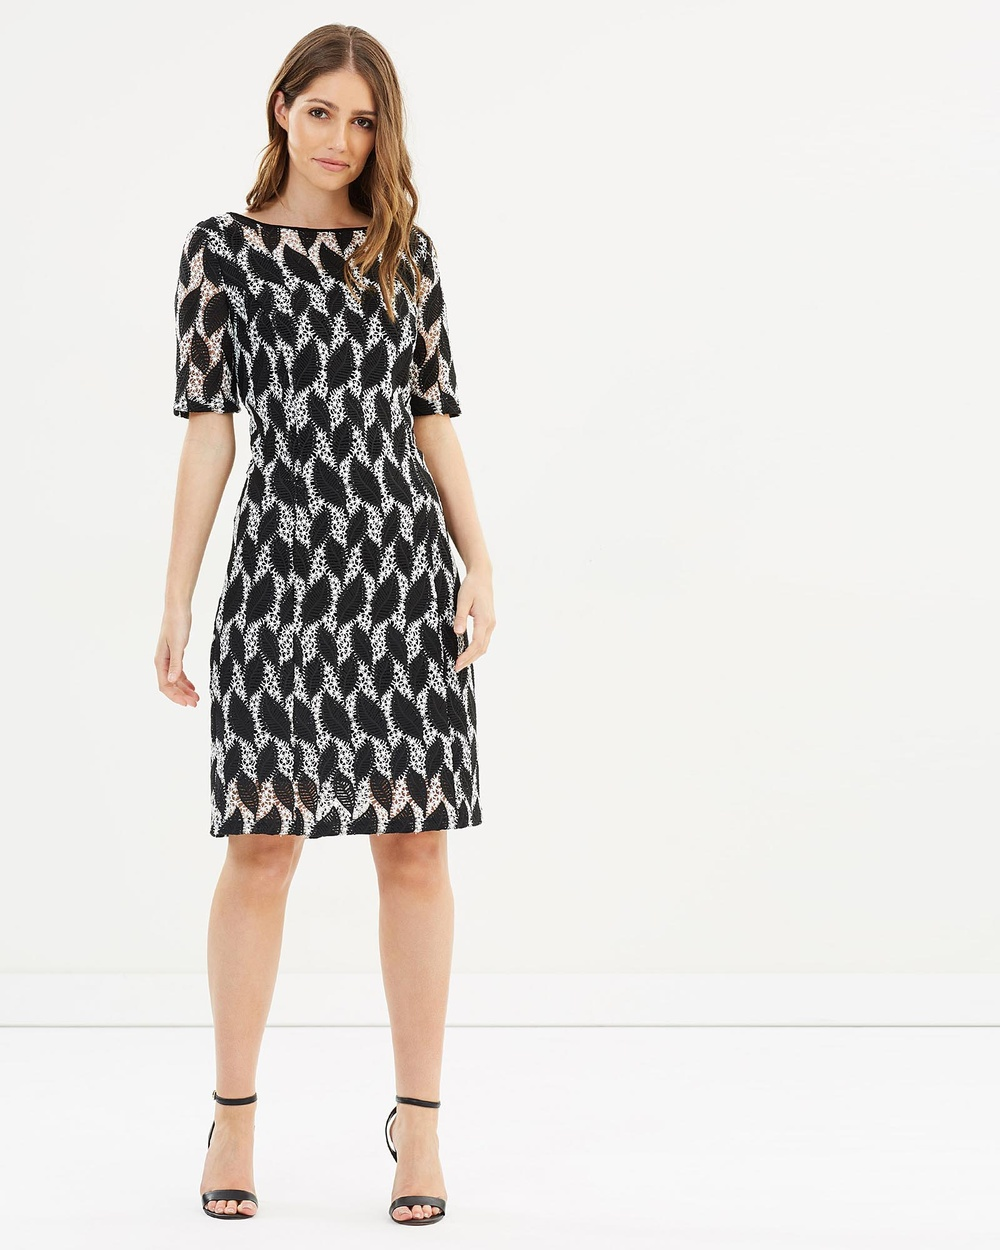 Faye Black Label Shapeshifter Shift Dress Dresses Black Shapeshifter Shift Dress